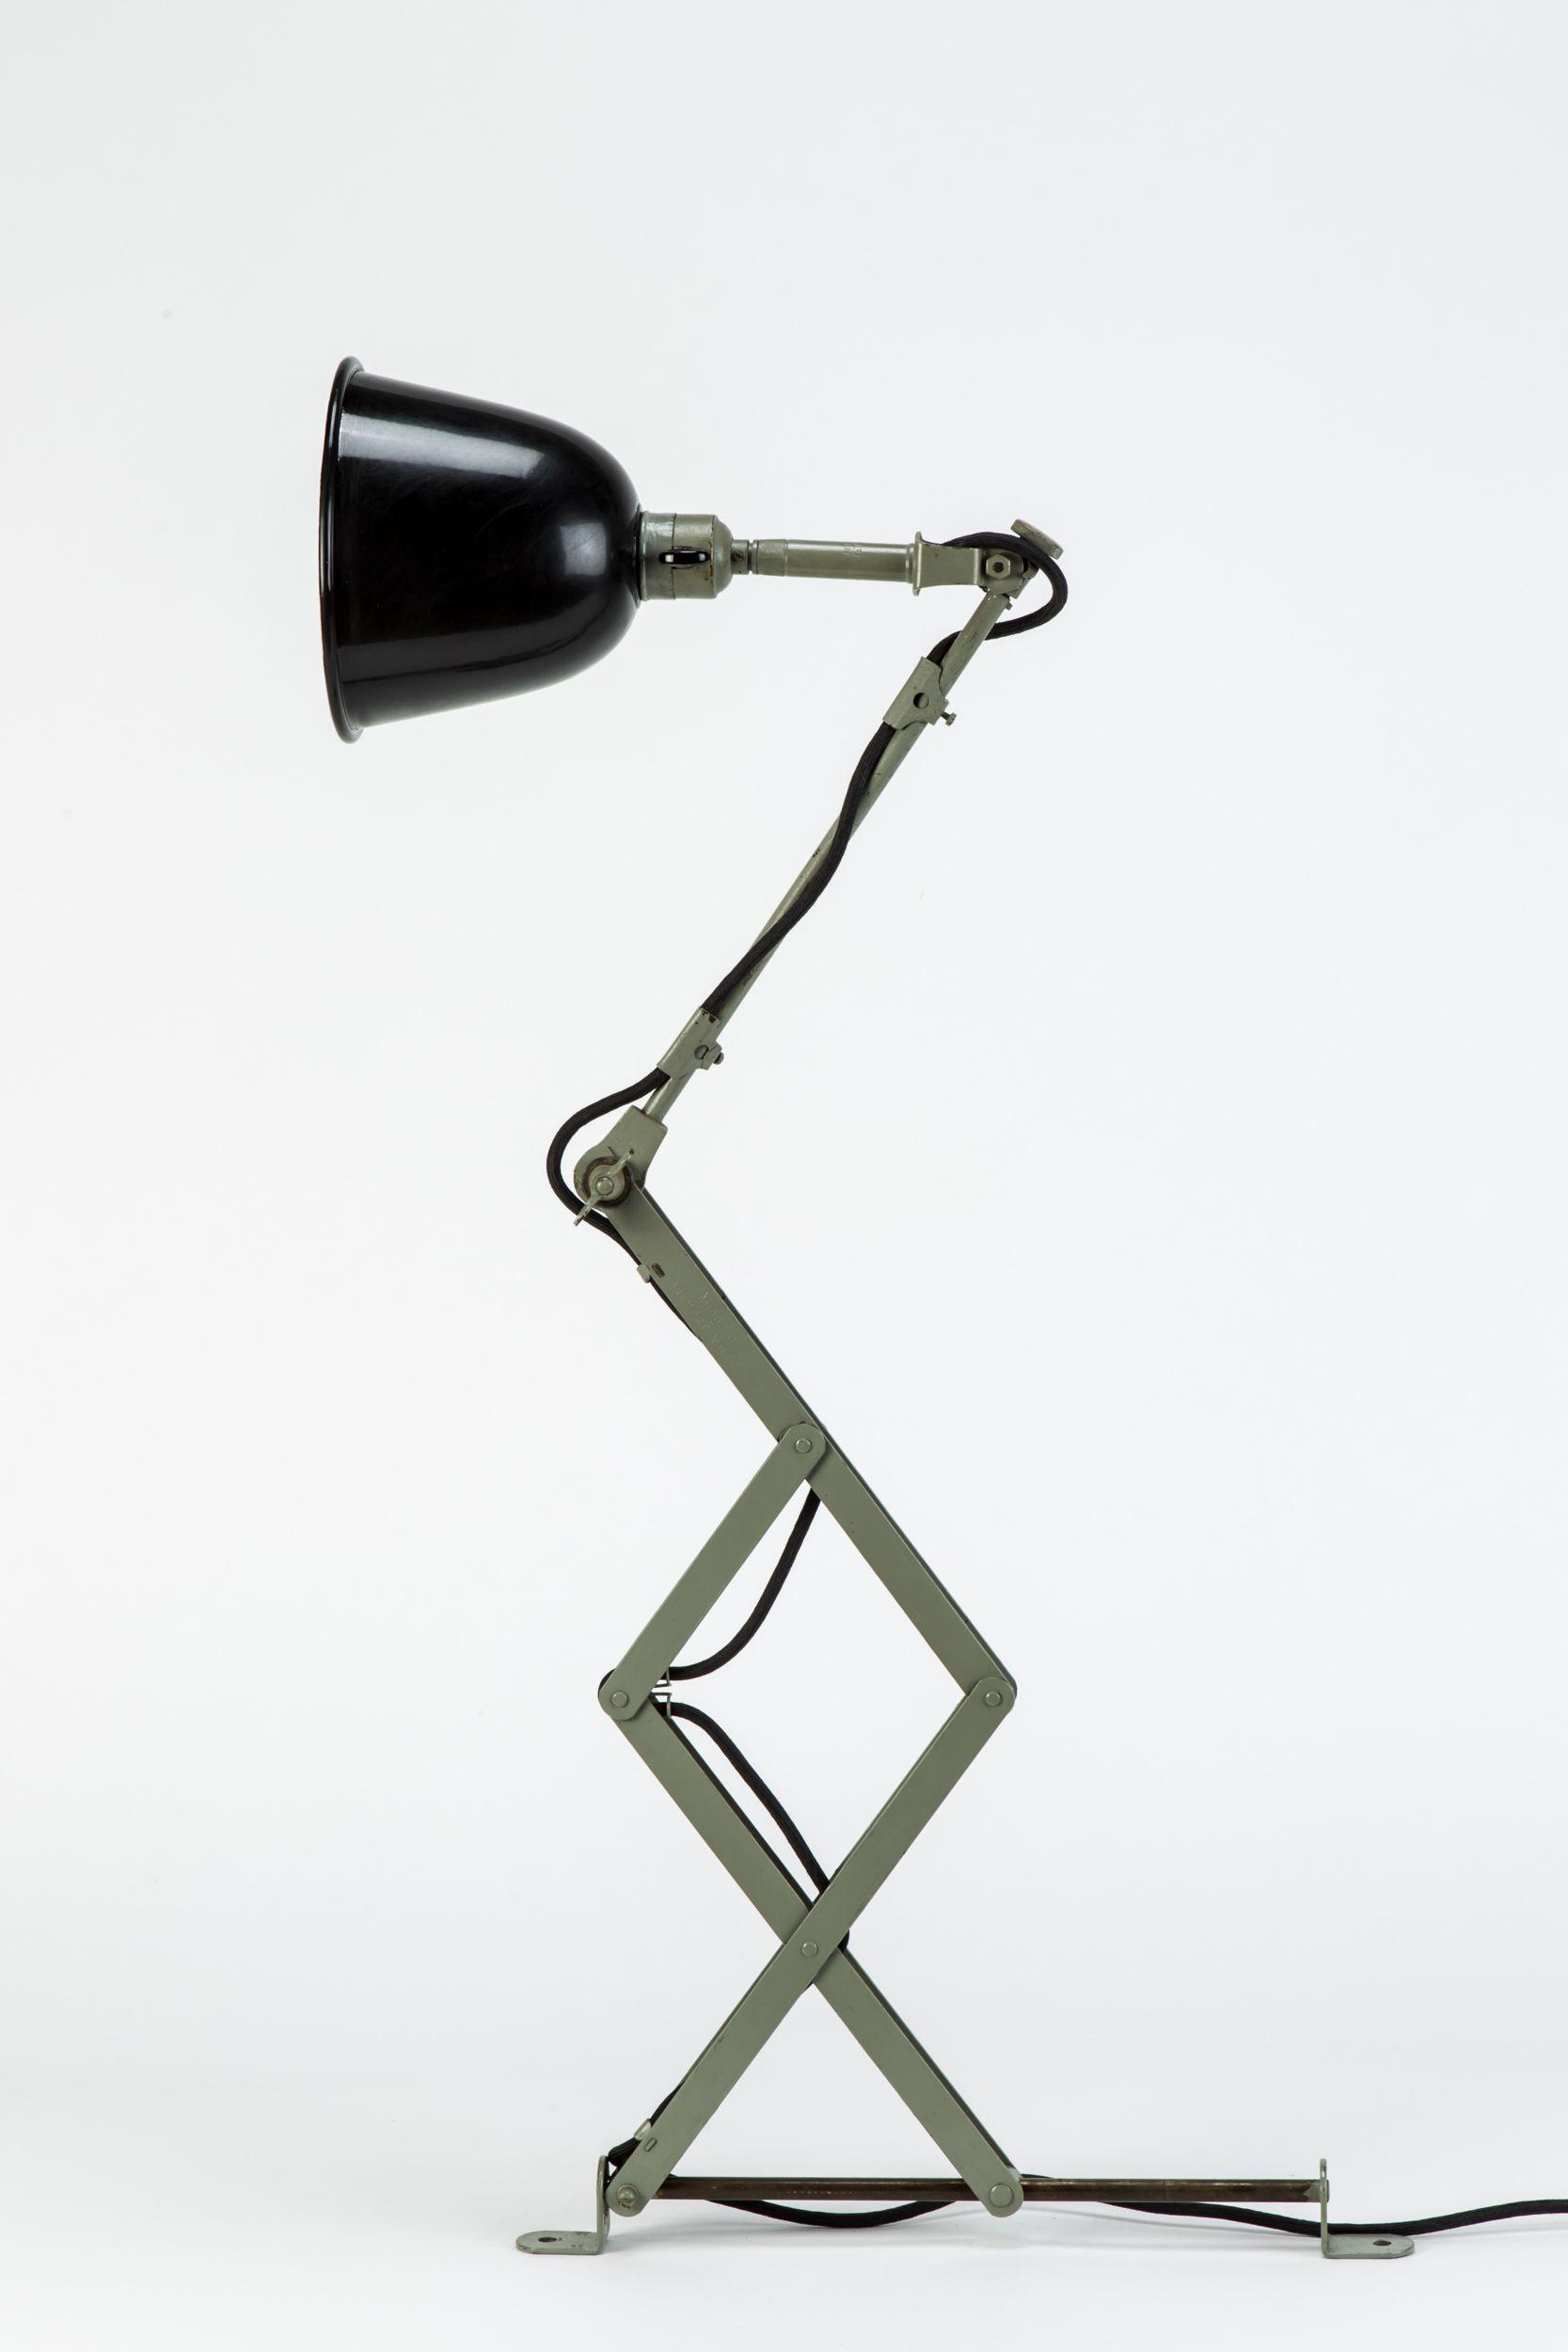 Bauhaus pendant lamp marianne brandt and hans przyrembel 1925 - Curt Fischer Bauhaus Lamp Late 1920s Early 1930s Made For Walter Gropius